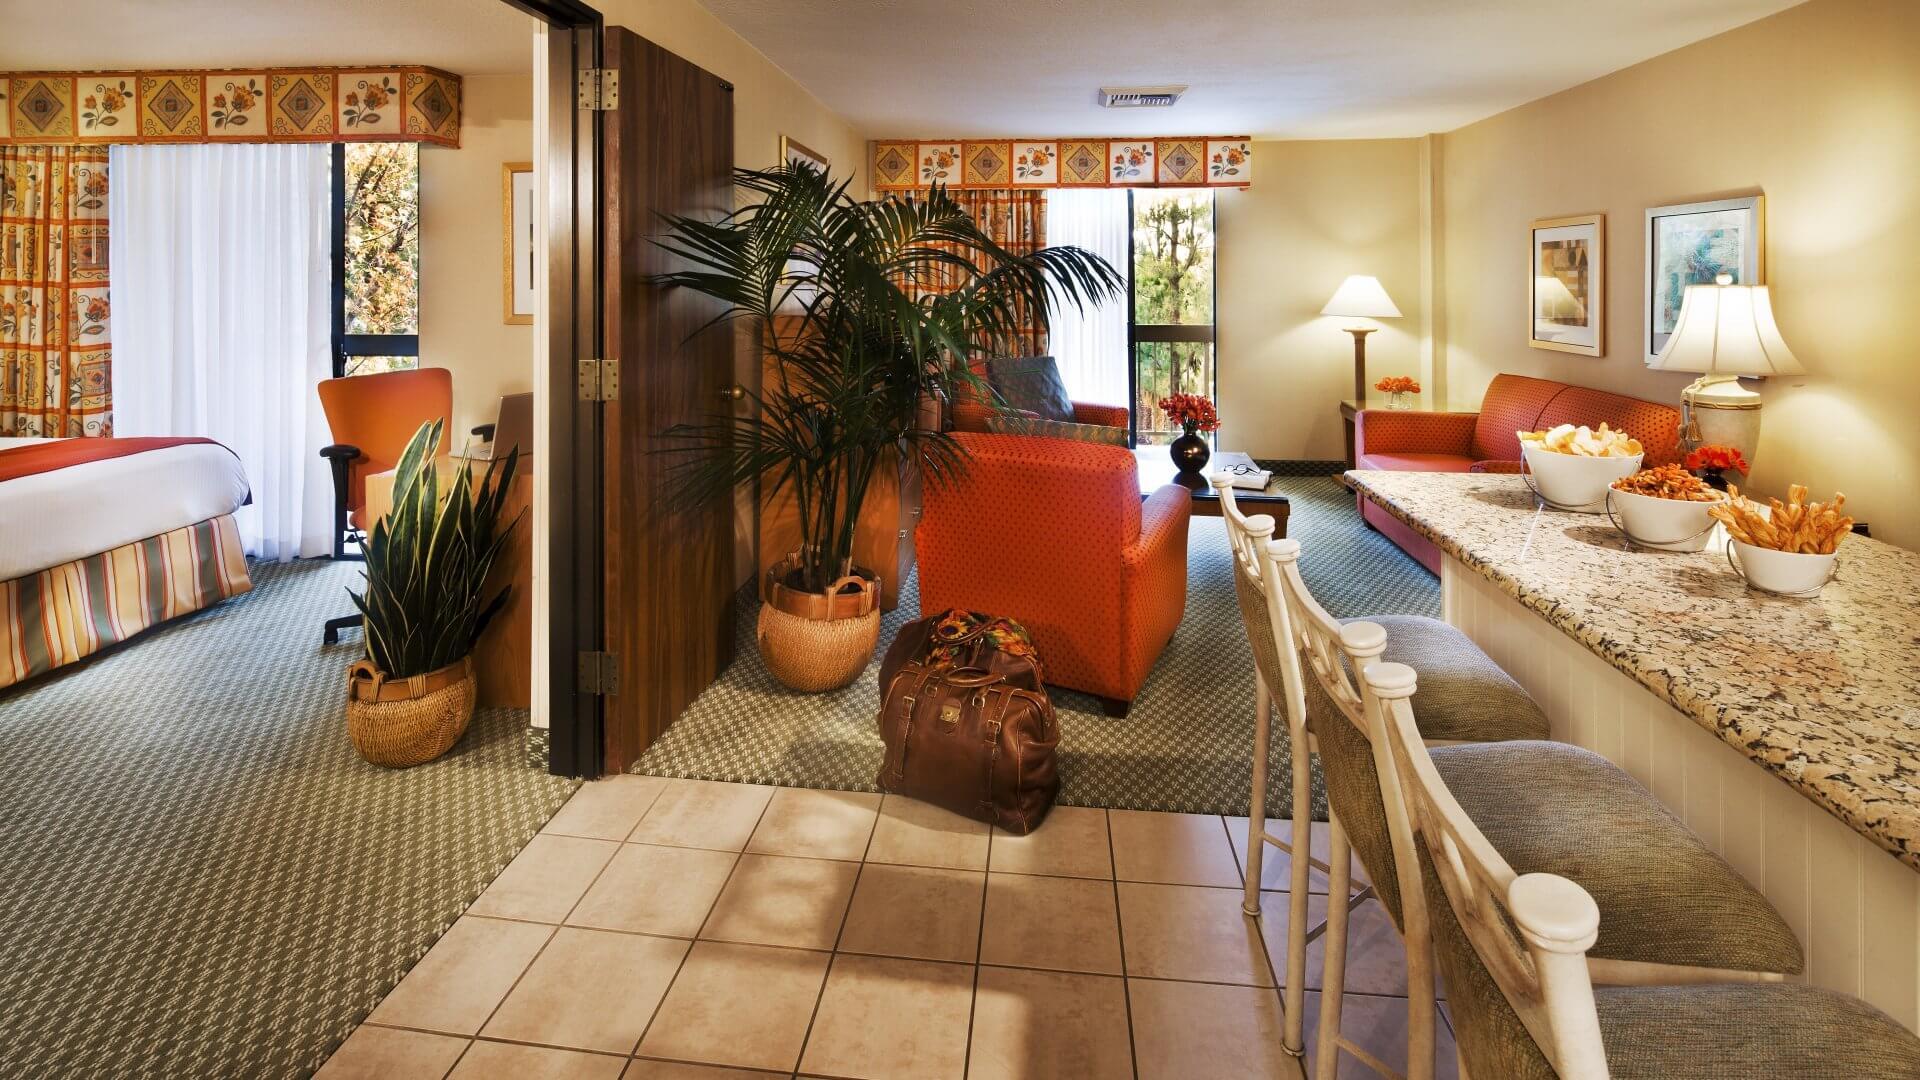 Howard Johnson Anaheim hotel room interior